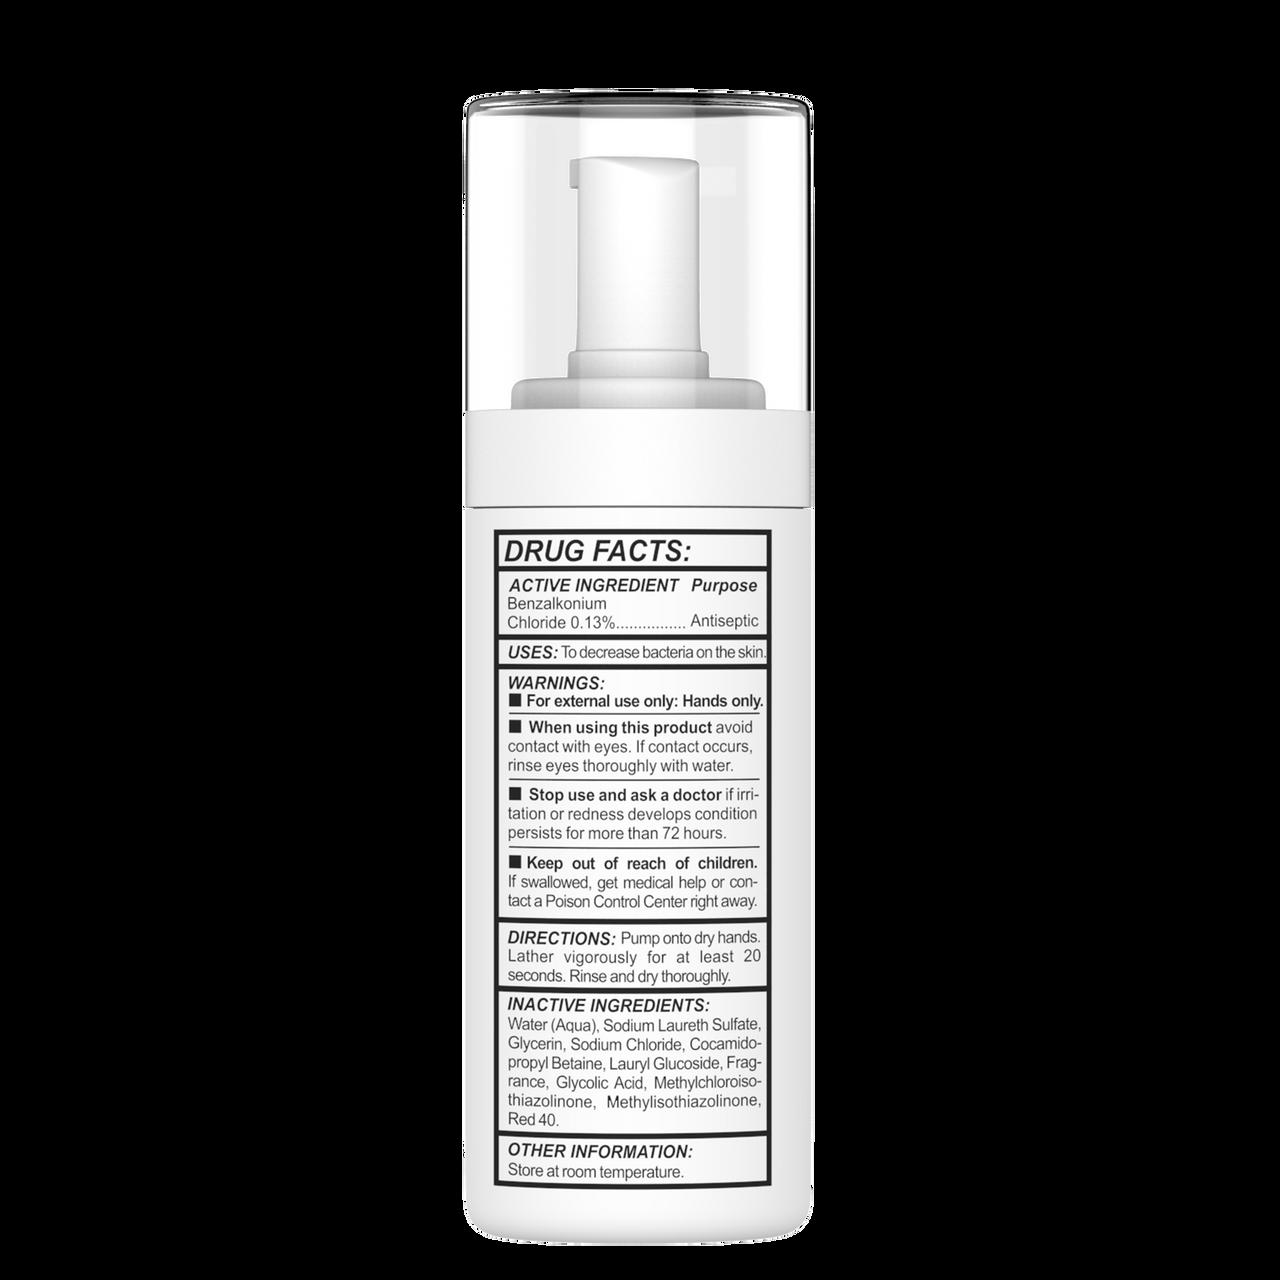 Antibacterial Hand Soap Ingredients